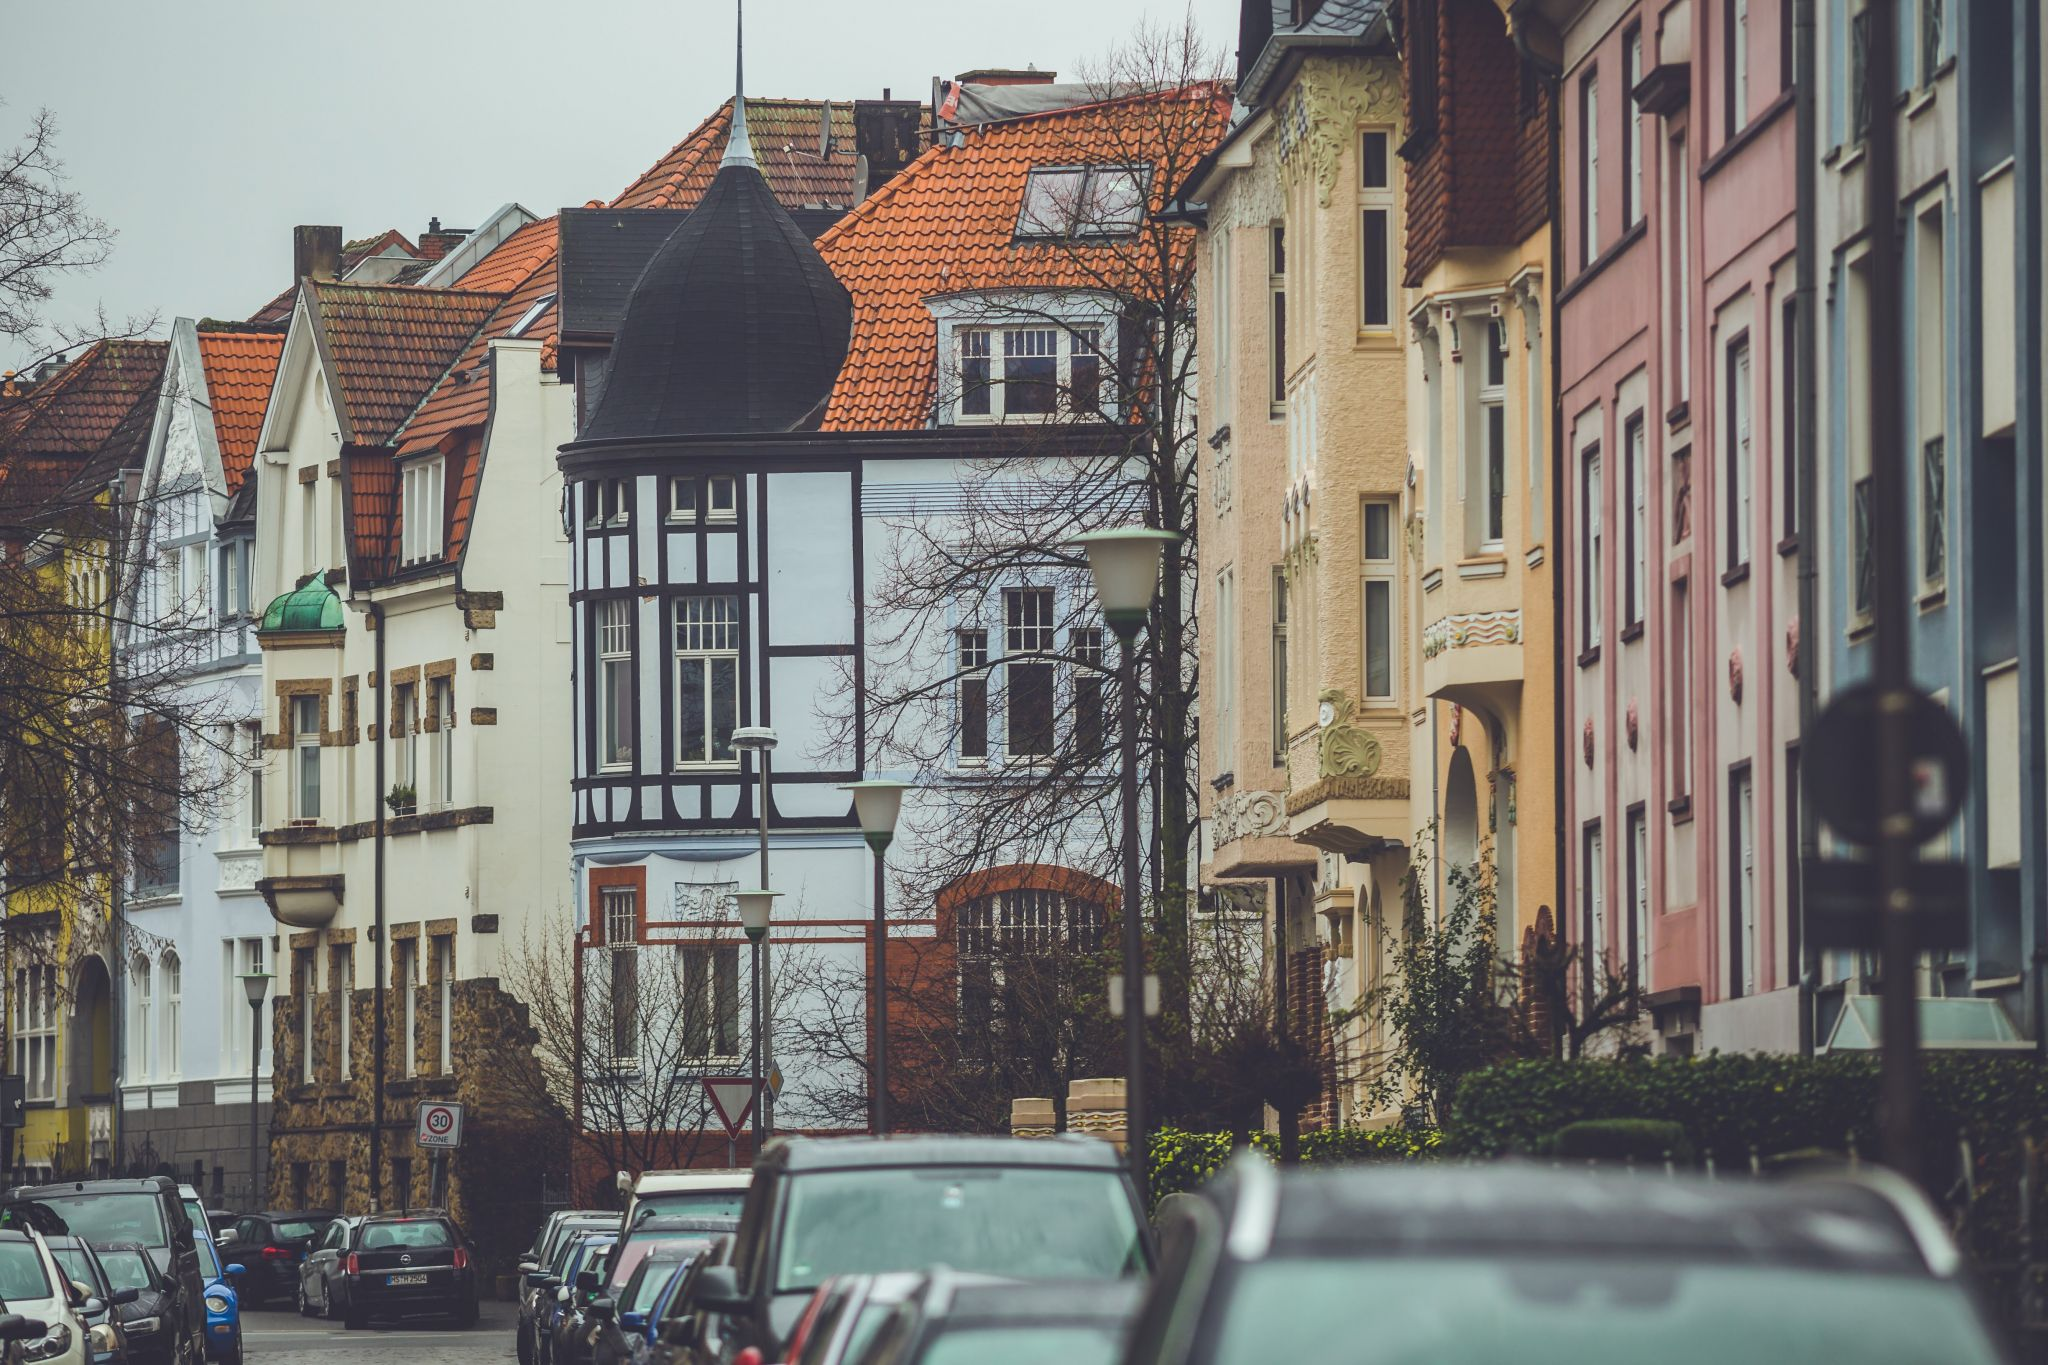 Münster X-Viertel, Germany